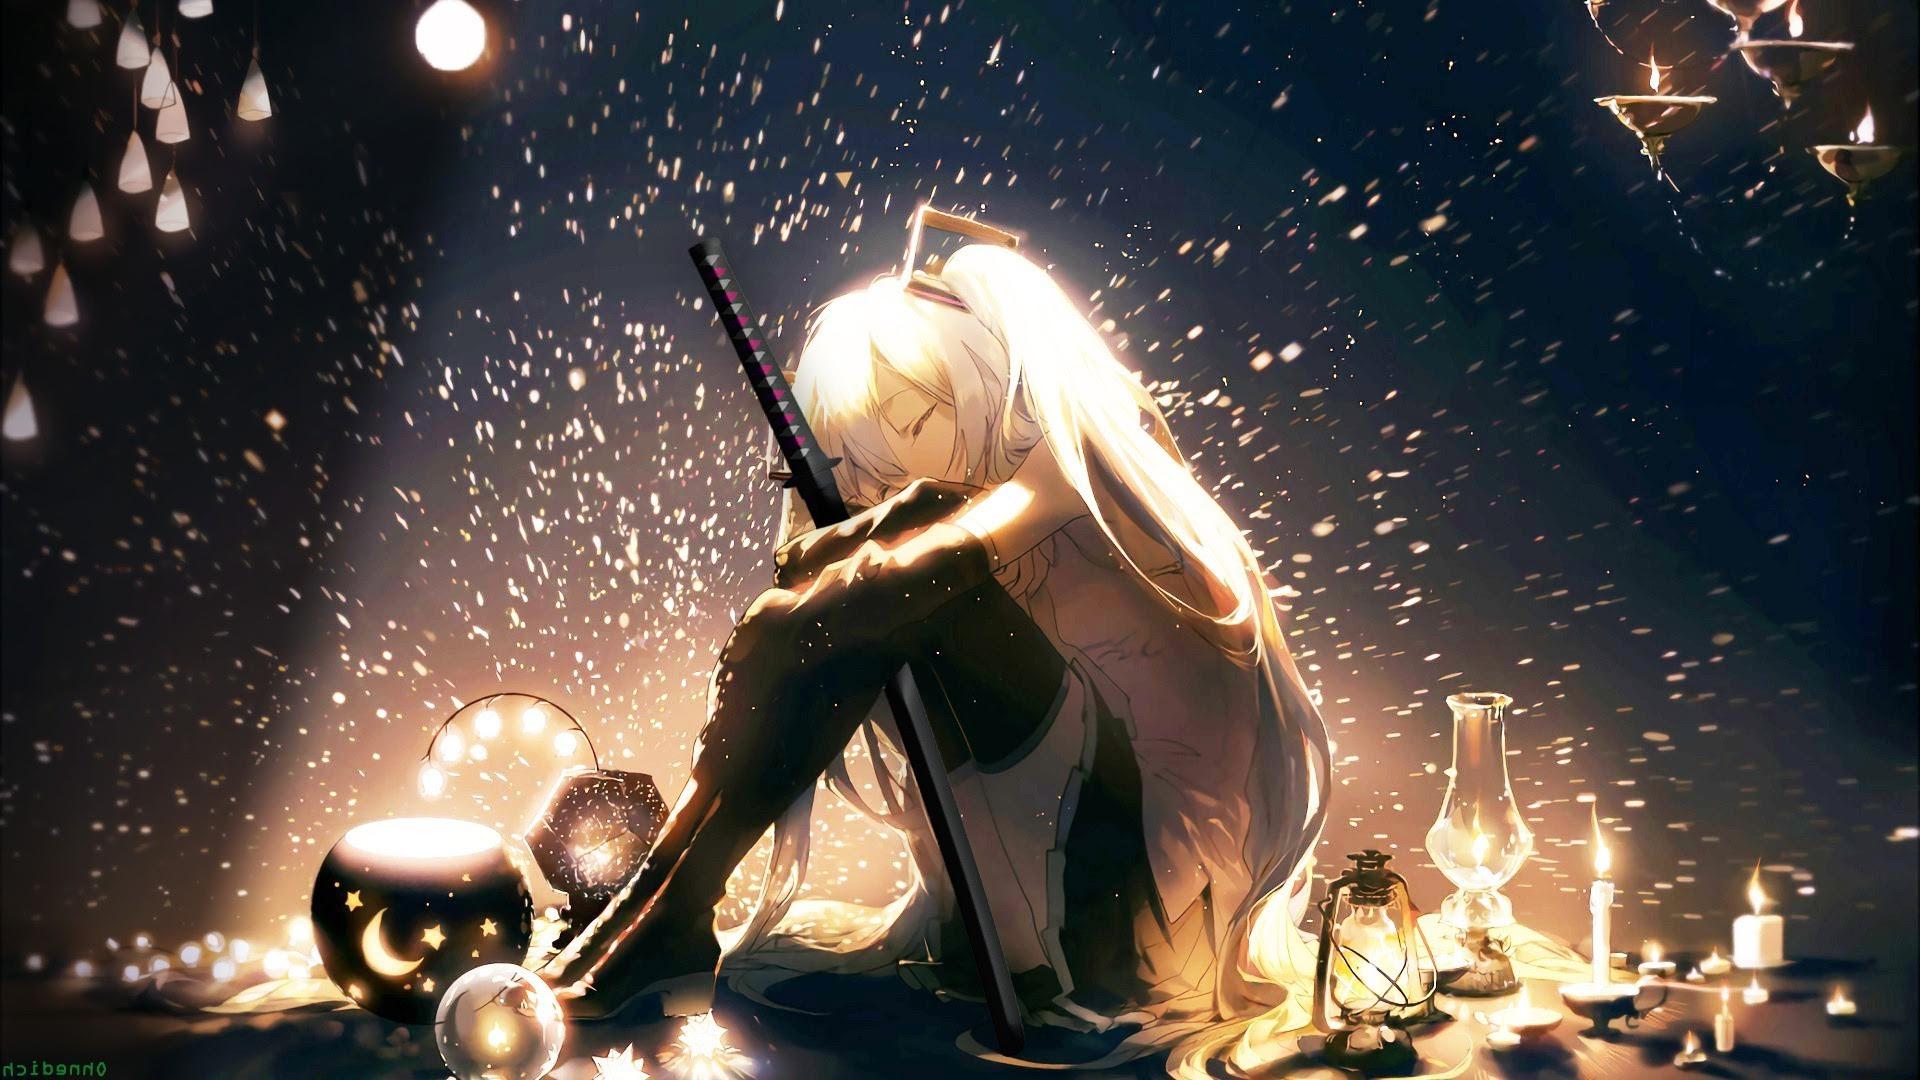 Download 780 Koleksi Wallpaper Hd Anime Girl Katana HD Terbaik